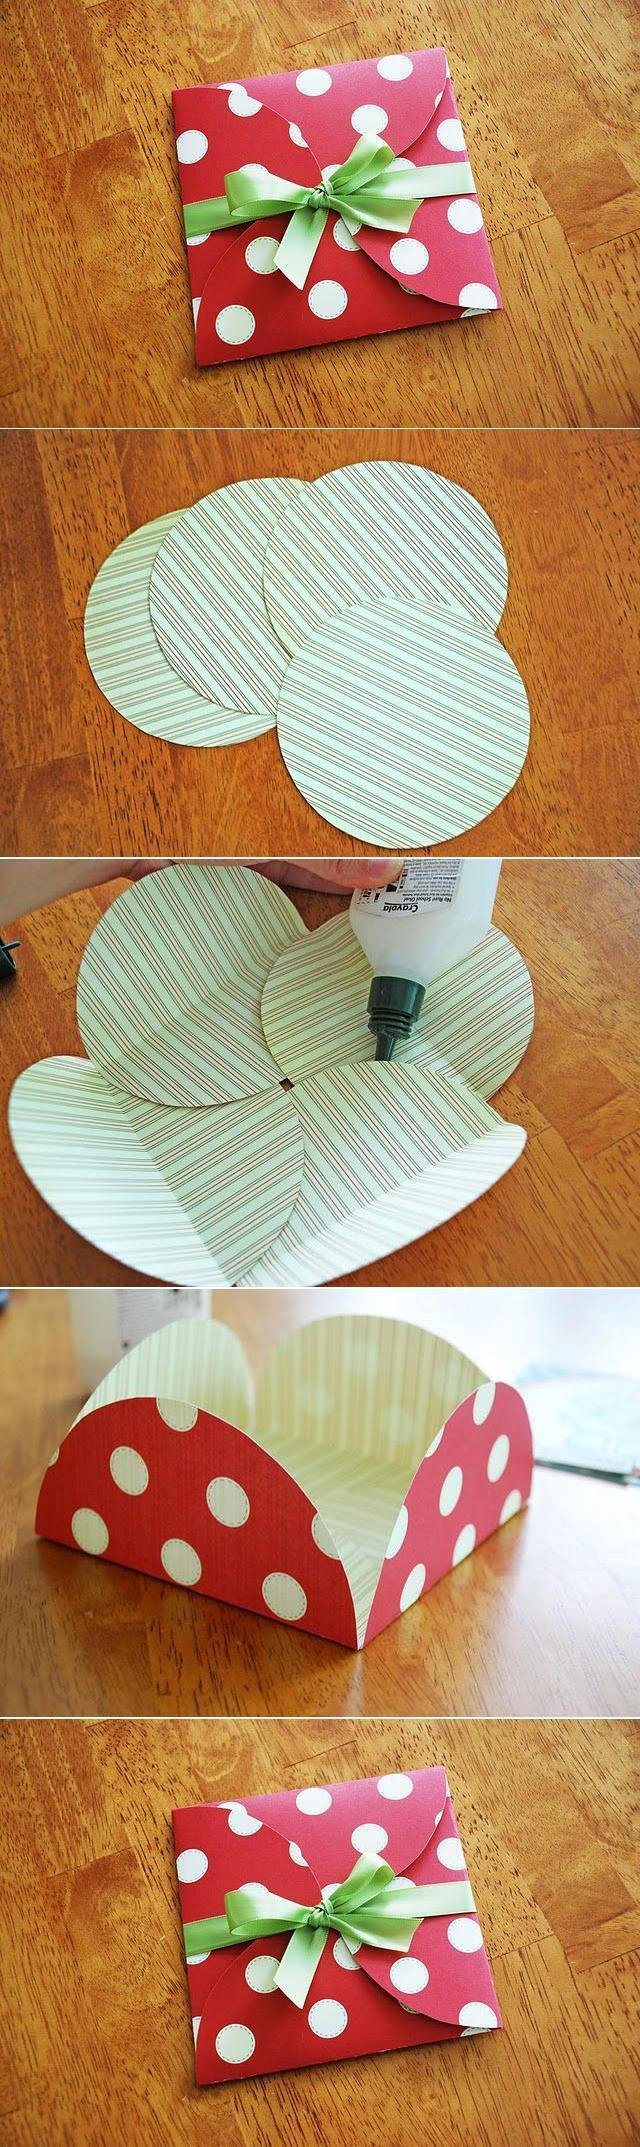 DIY Simple Beautiful Envelope DIY Projects | UsefulDIY.com